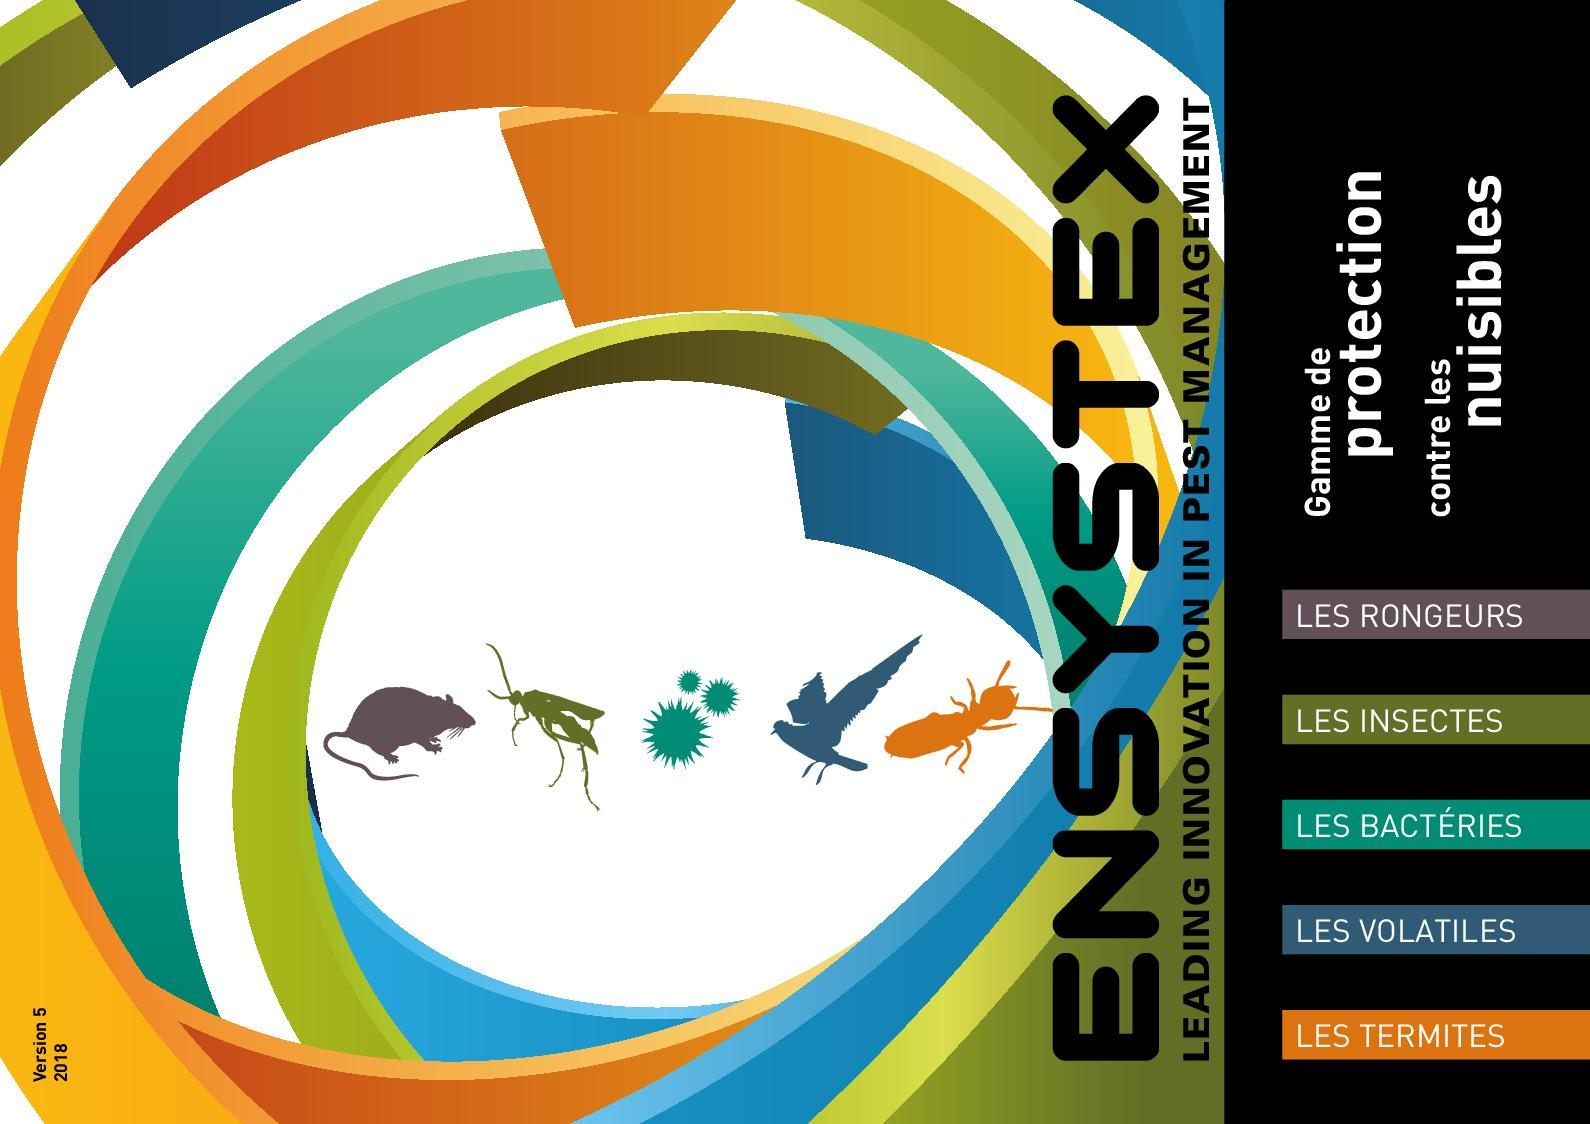 Punaise De Lit Contagieux De Luxe Calaméo Ensystex Europe Catalogue 2018